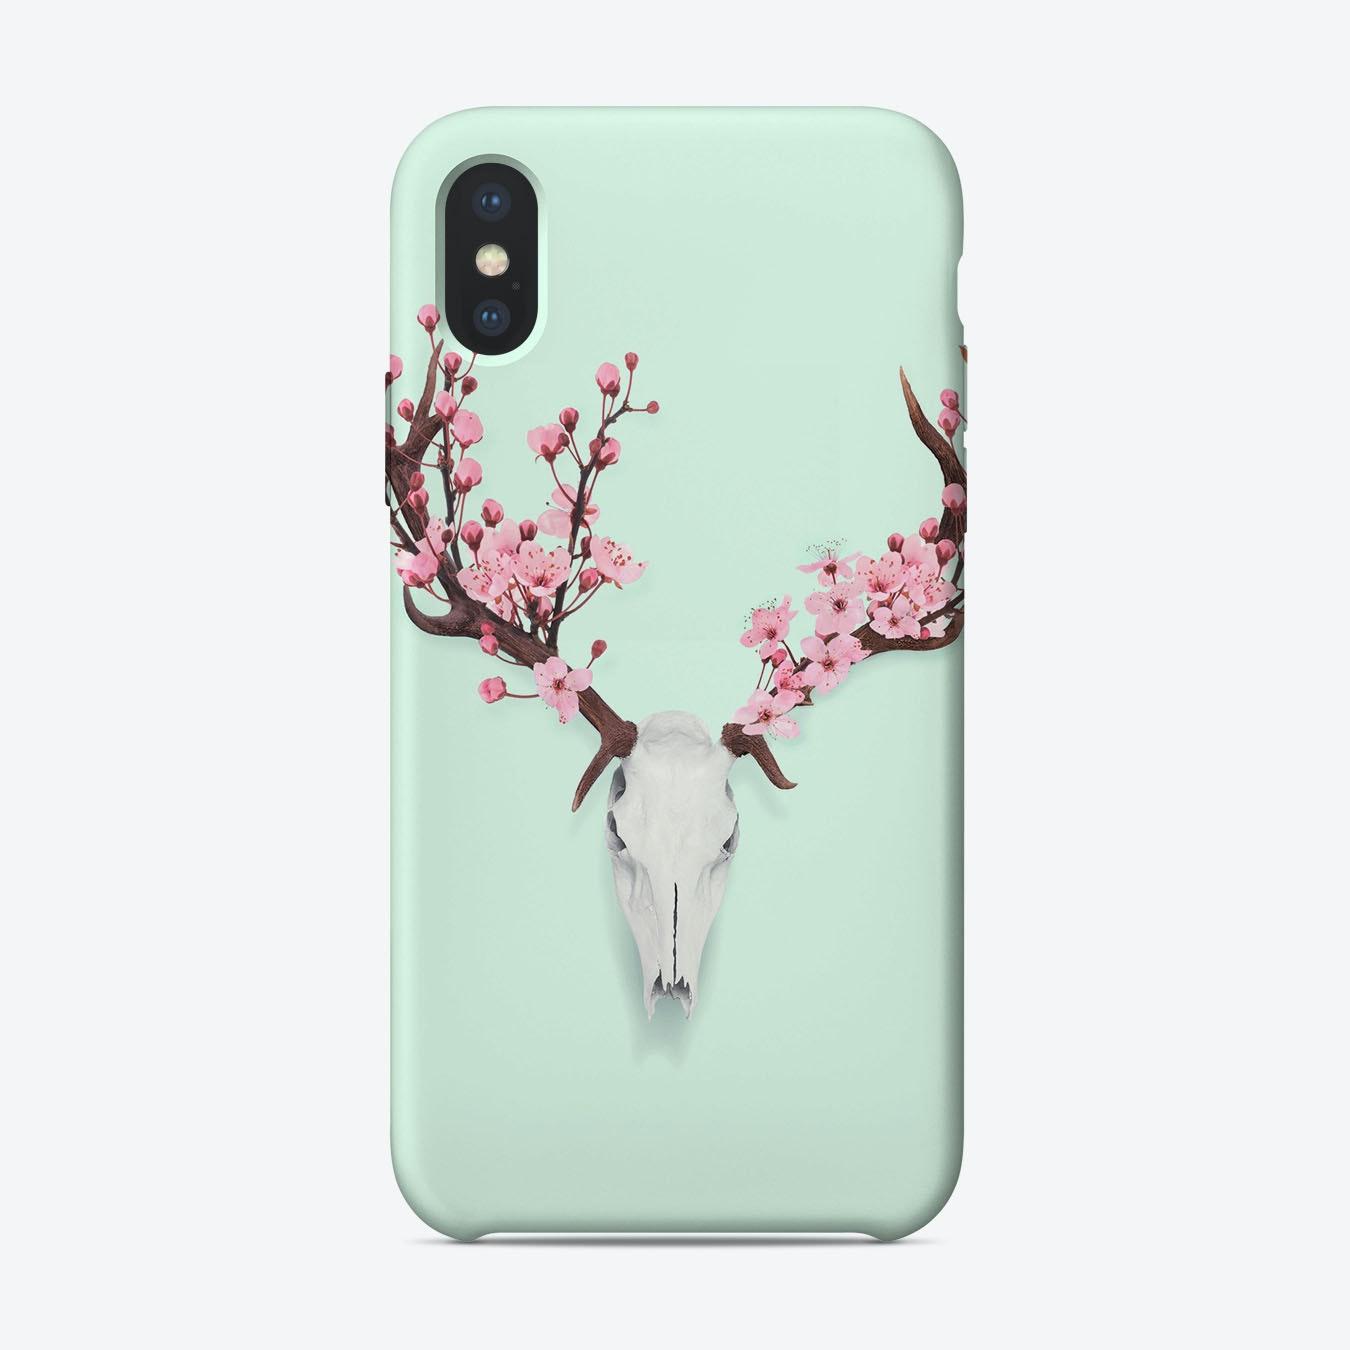 new arrival b9b11 fddb7 Cherry Blossom Skull iPhone Case